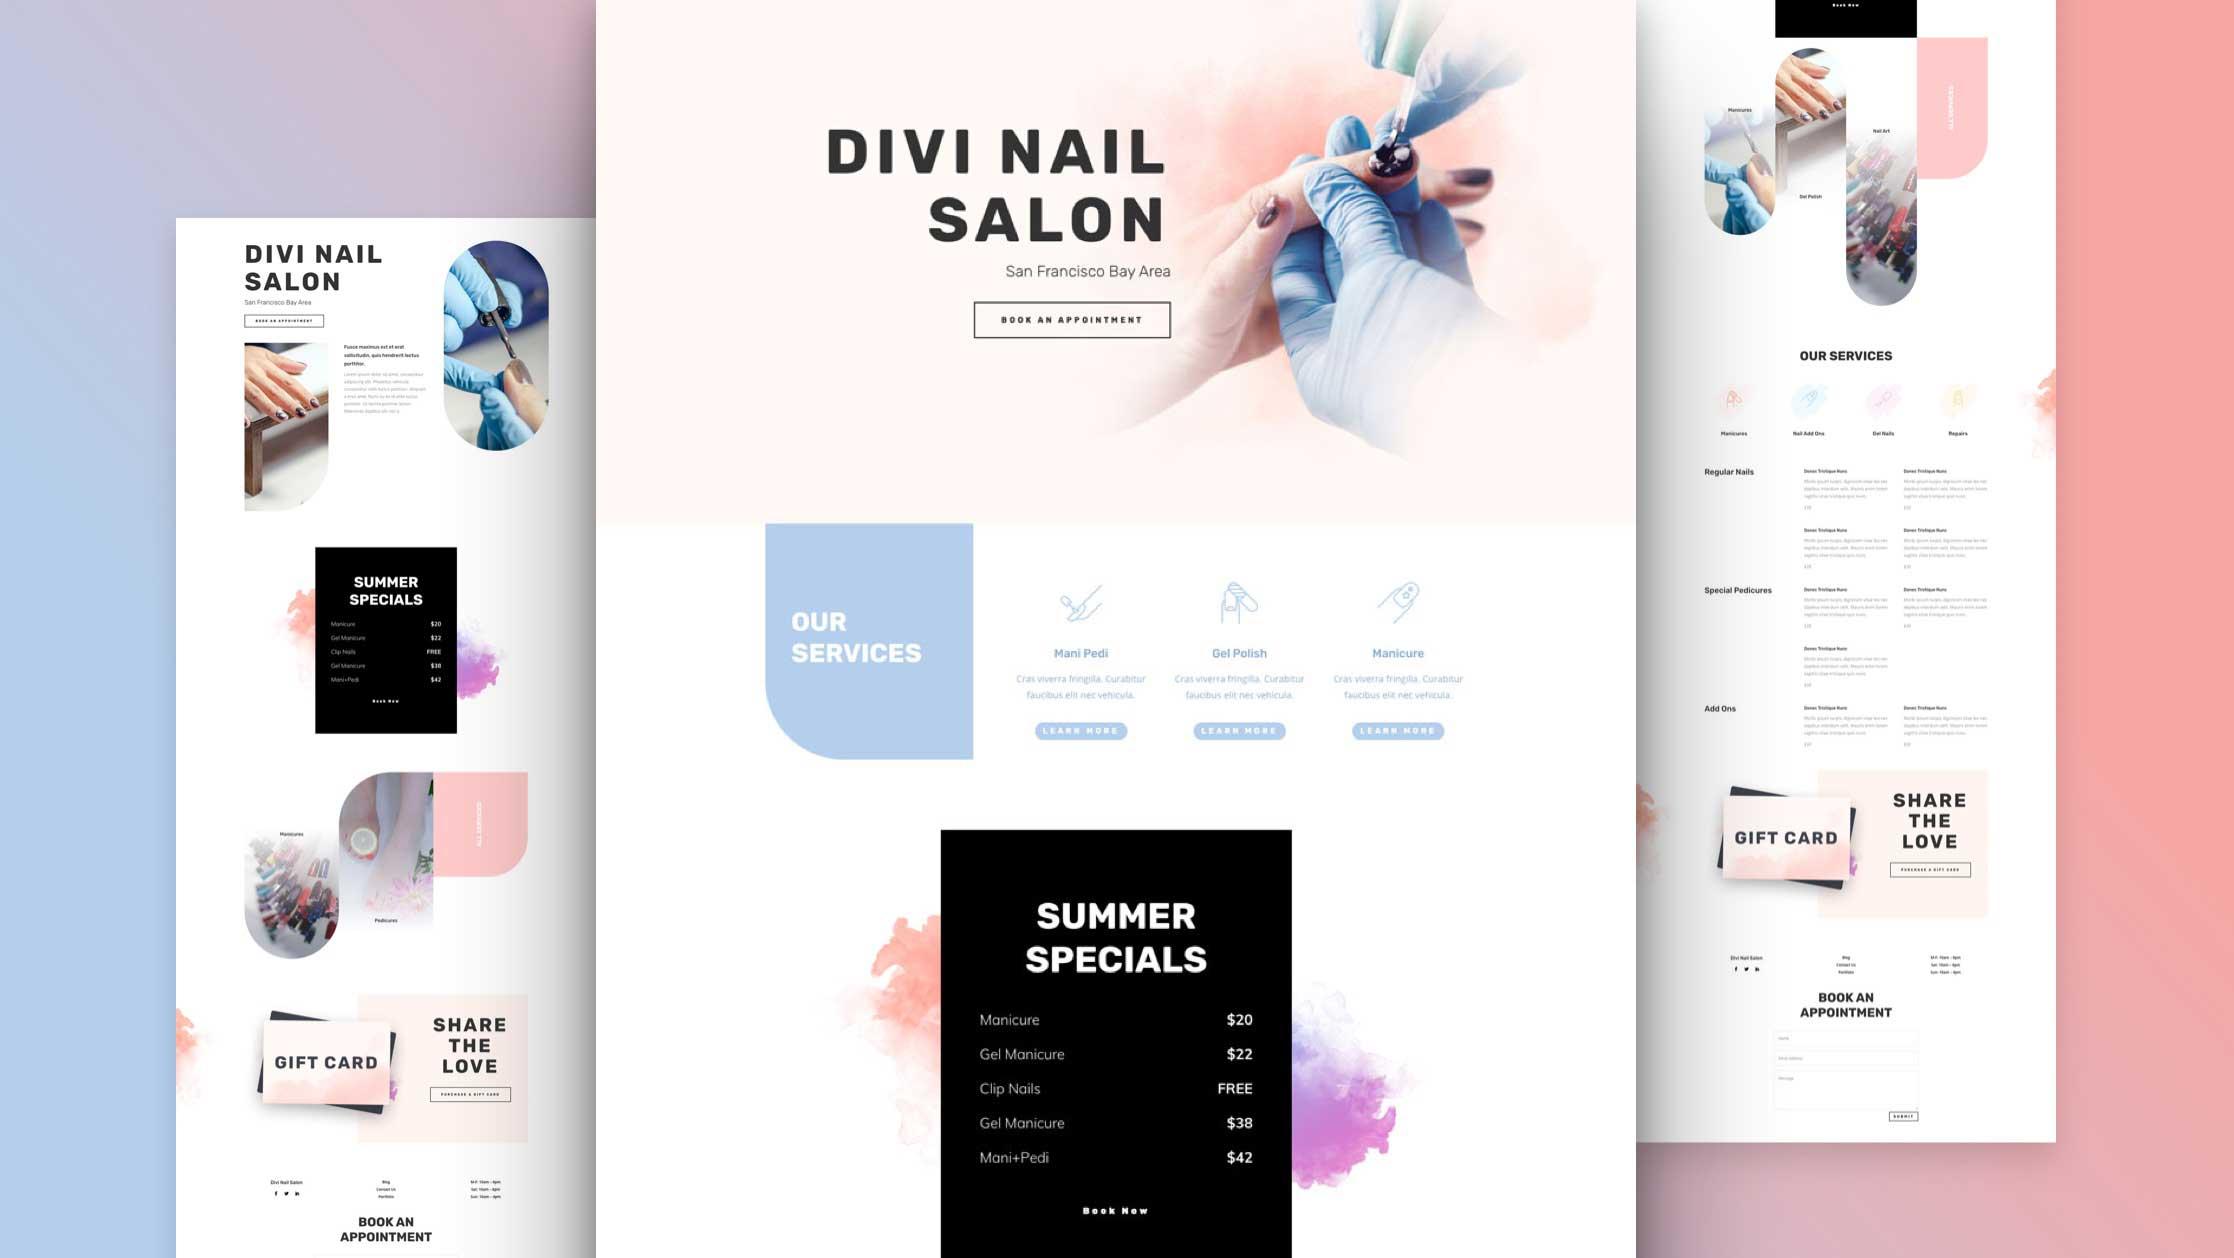 divi-nagelstudio-layout-pack-featured-image